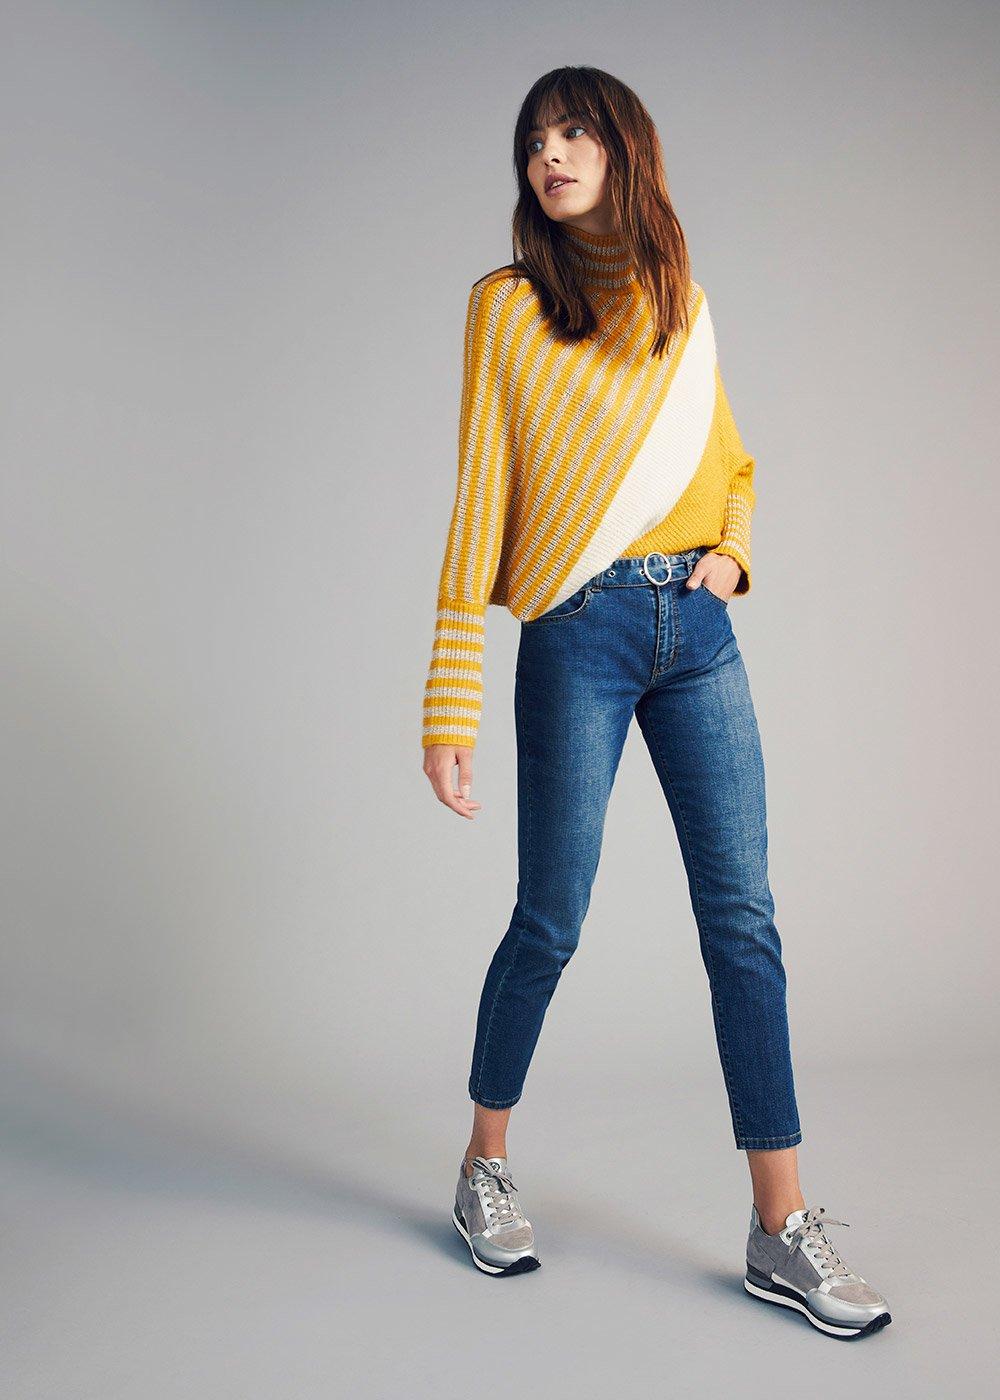 Kate jeans with denim belt - Denim - Woman